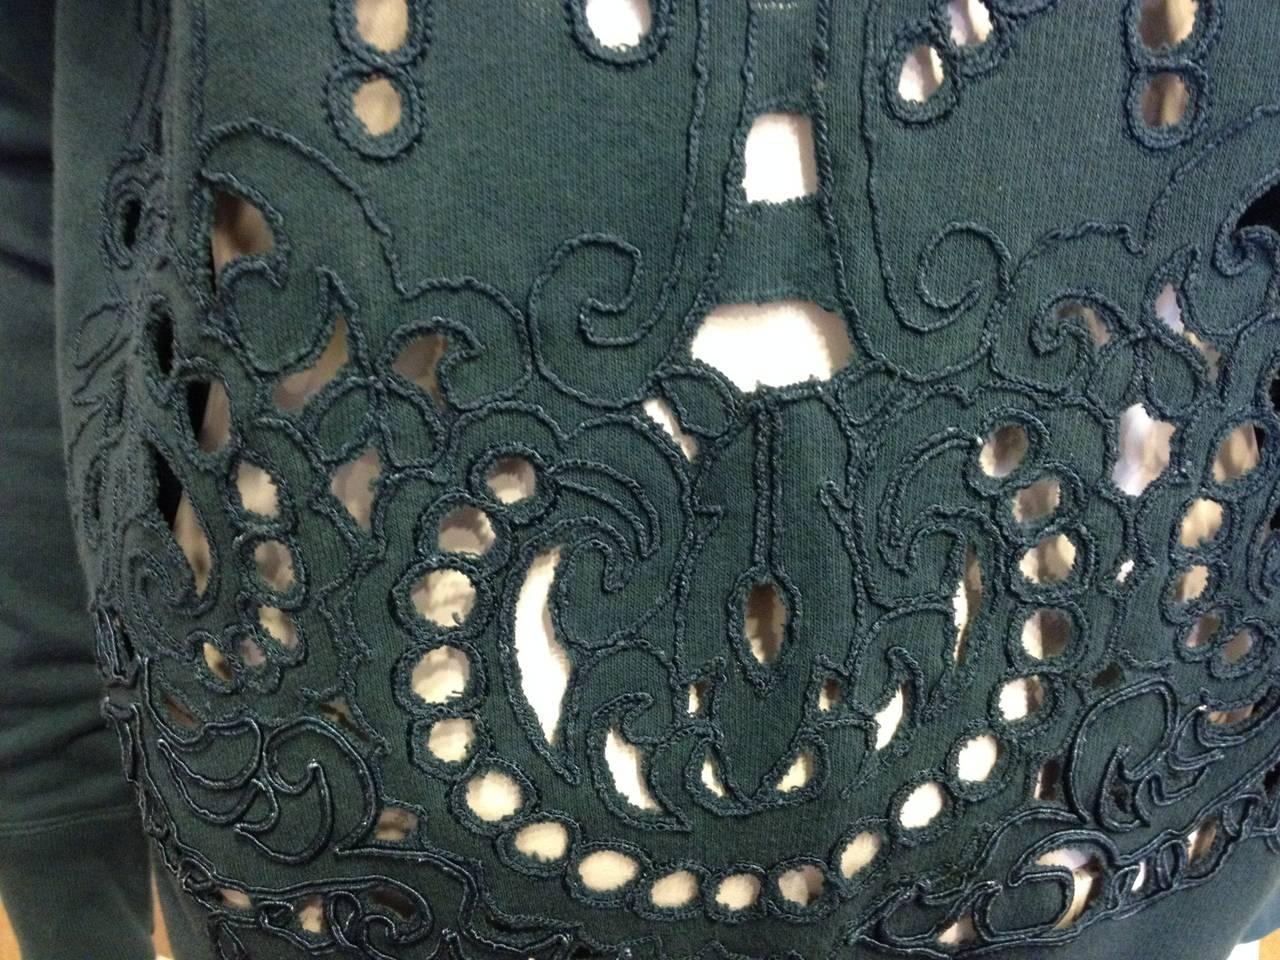 Dries Van Noten Teal Green Cutout Embroidered Sweatshirt 3